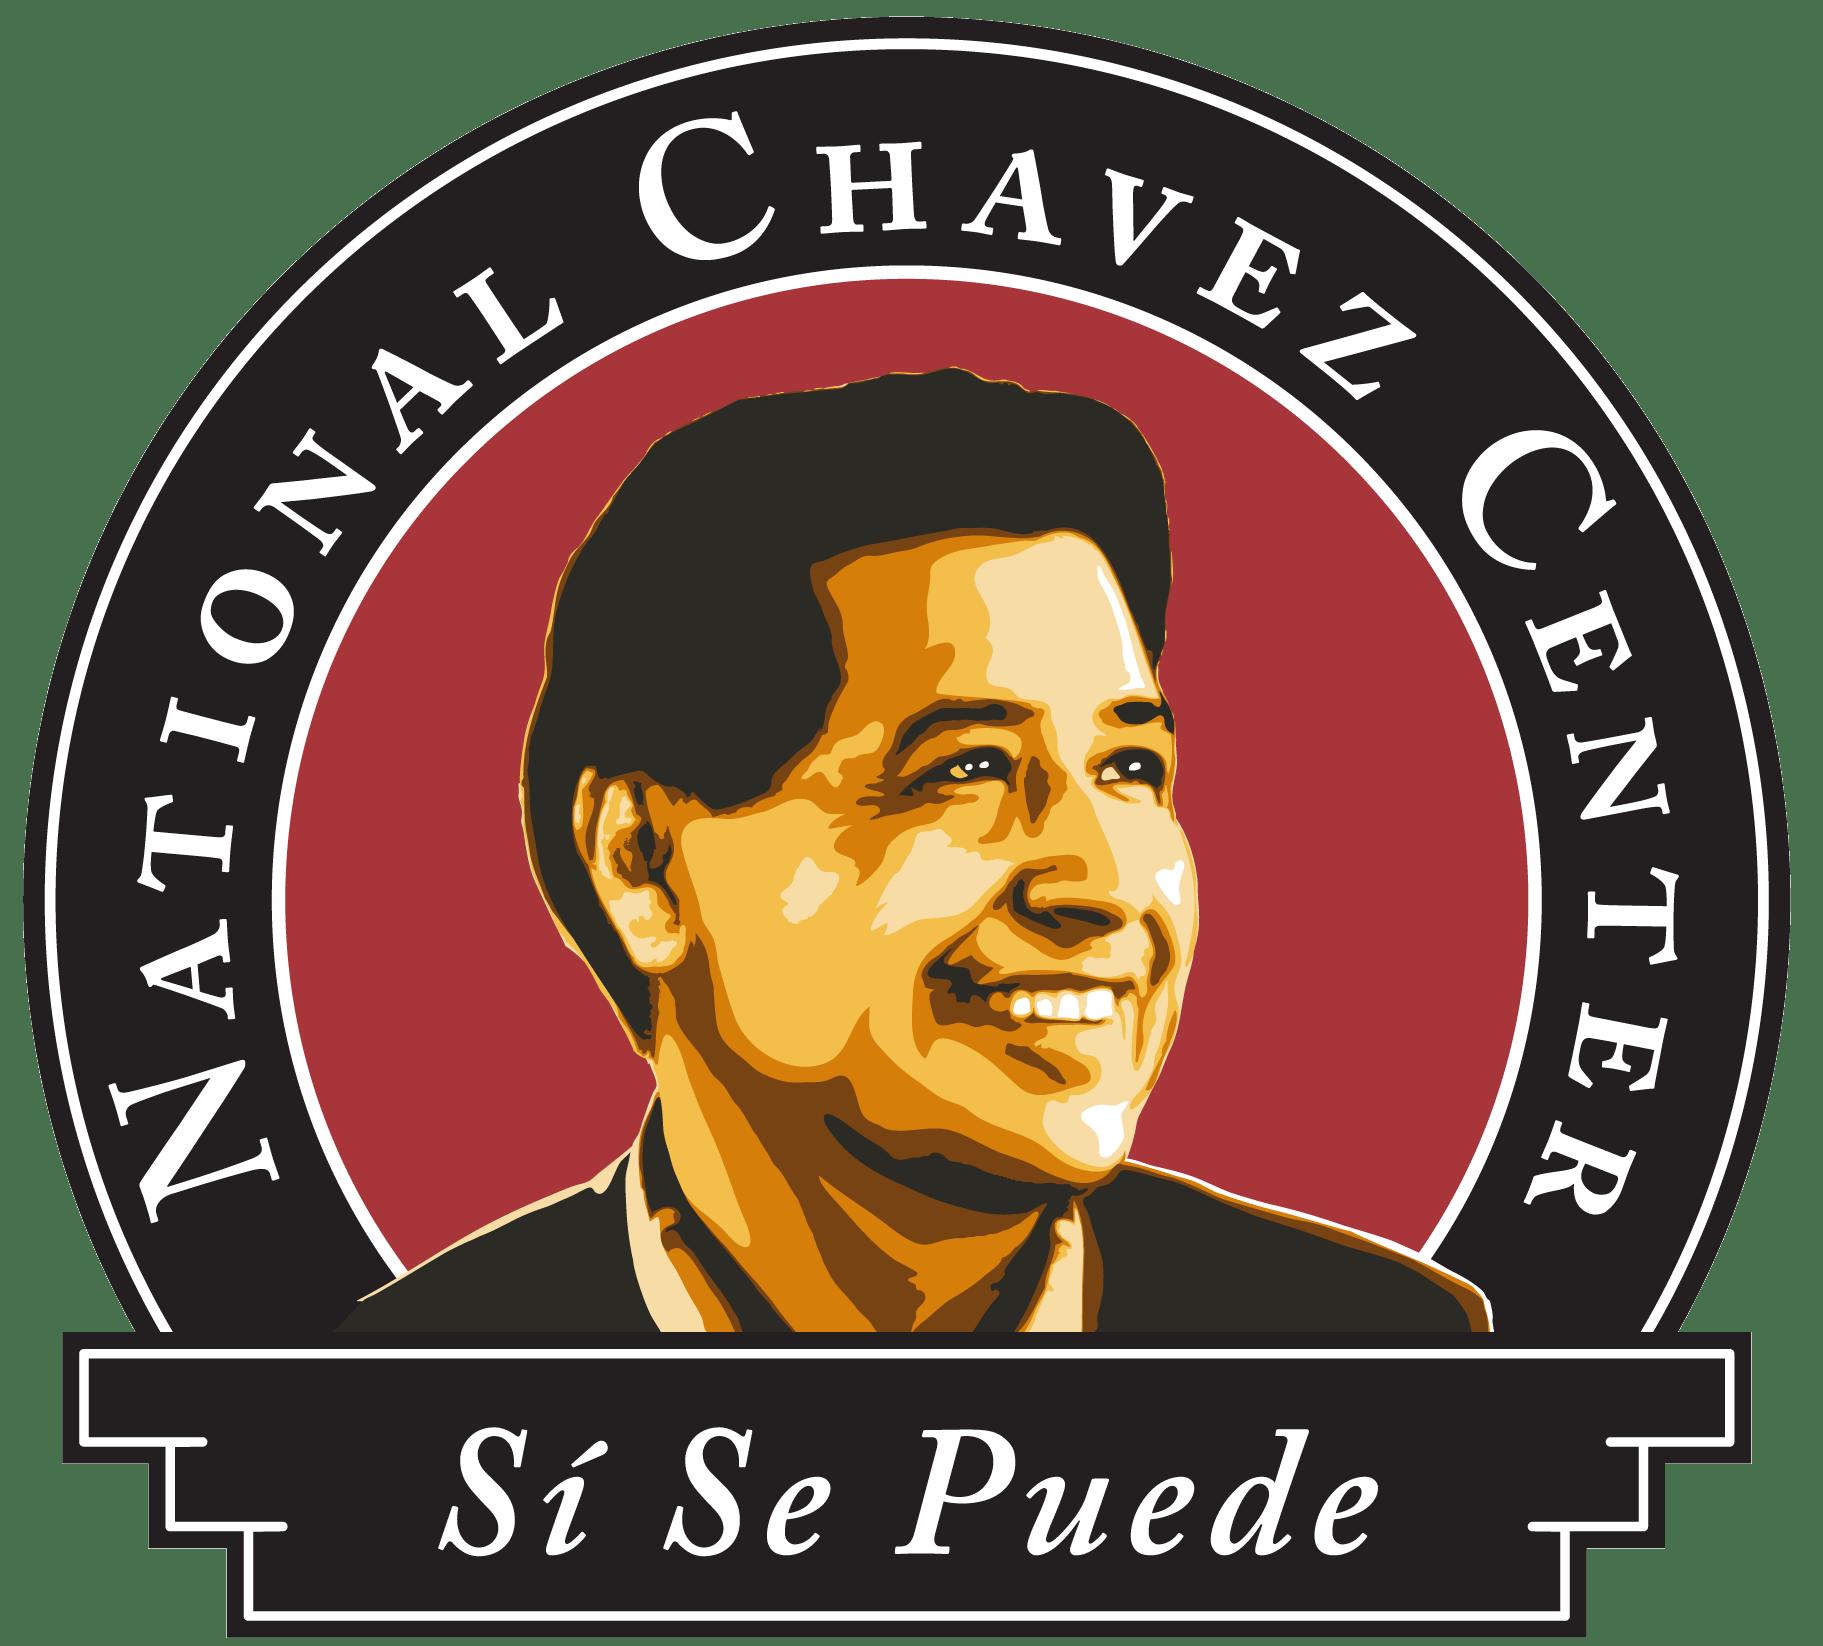 National Chavez Center Store